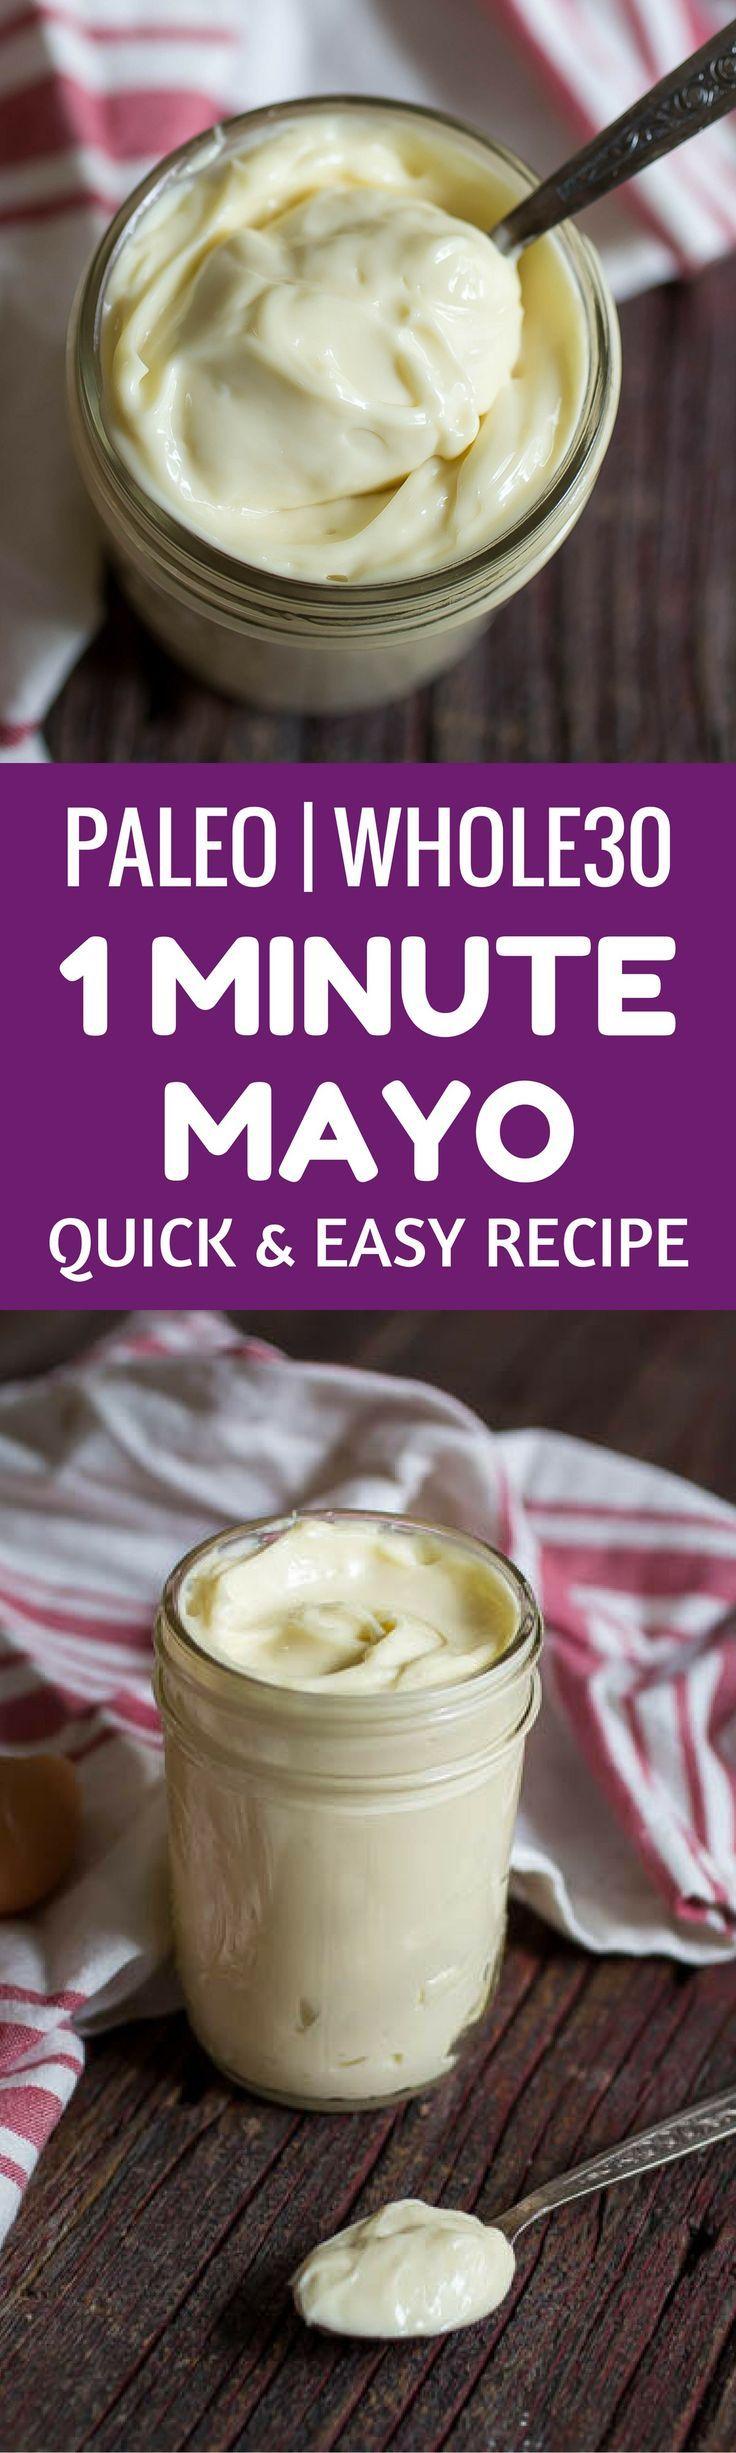 Whole30 1 Minute Mayo Recipe | The Movement Menu